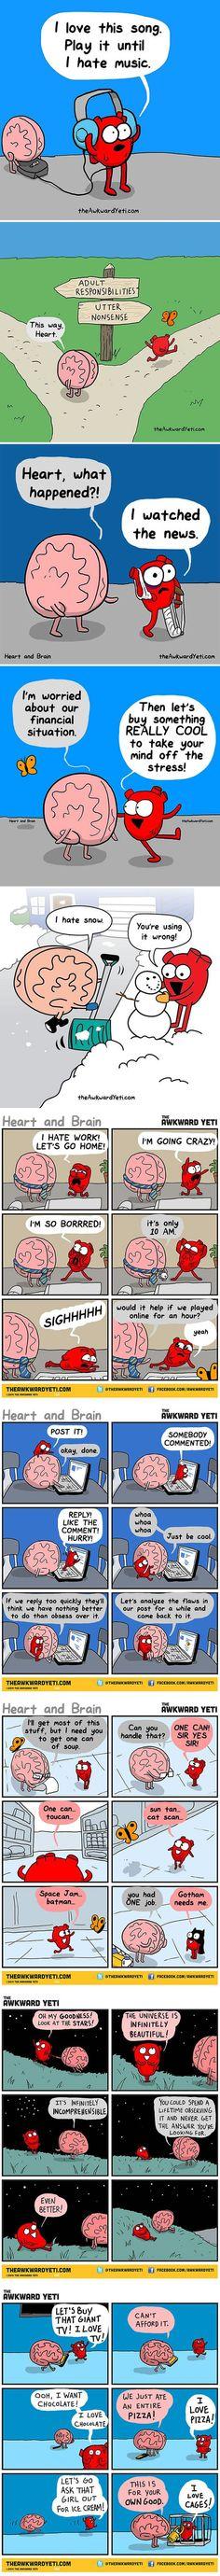 Heart vs. Brain (by Awkward Yeti, all credits to him)